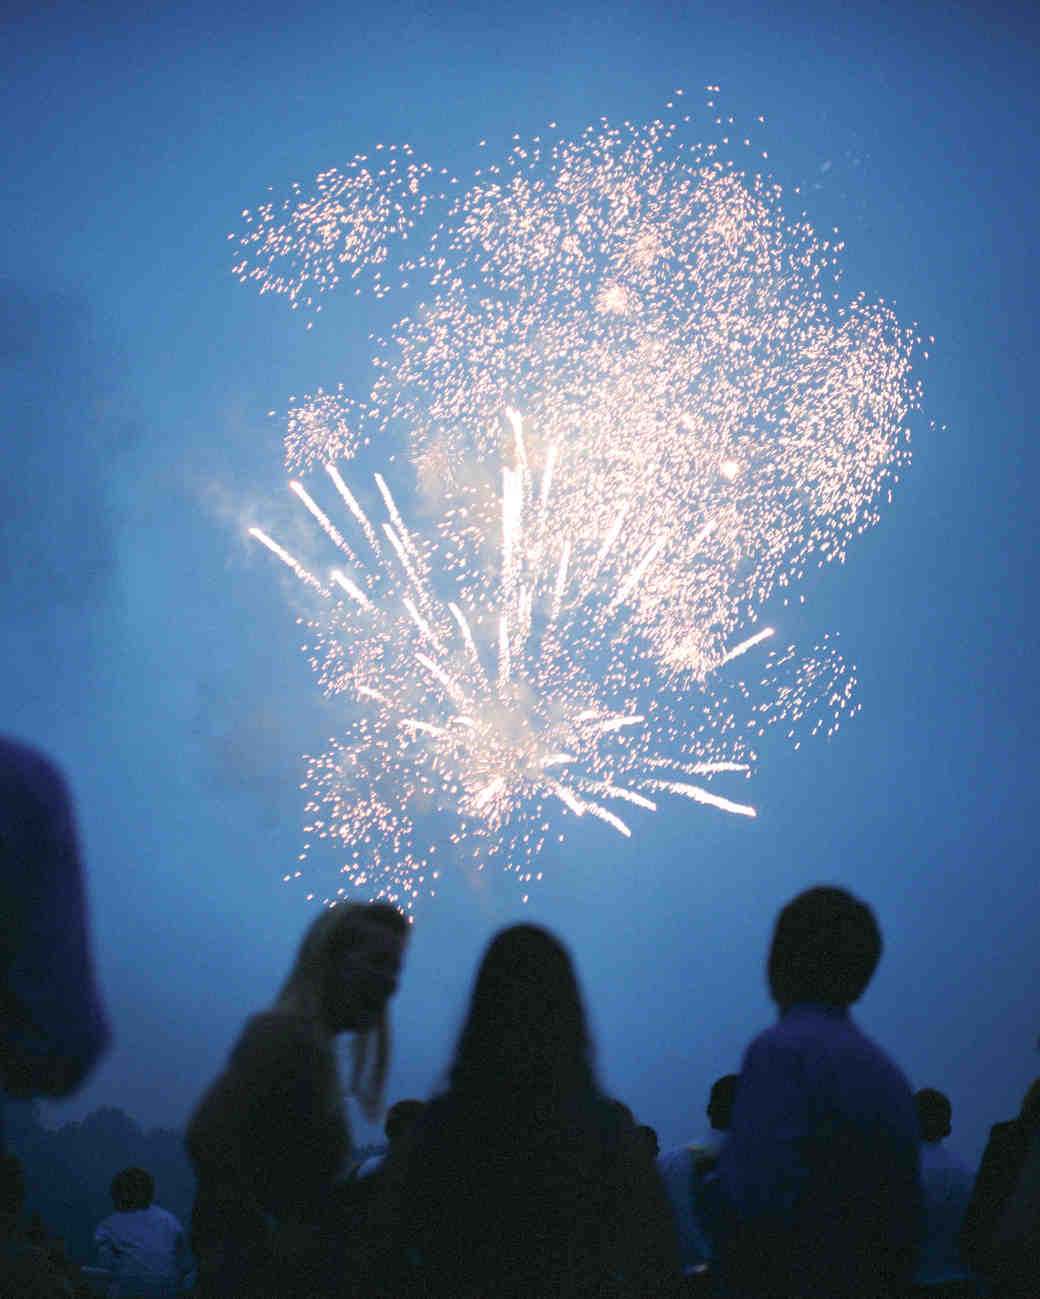 fireworks-mwd107926.jpg